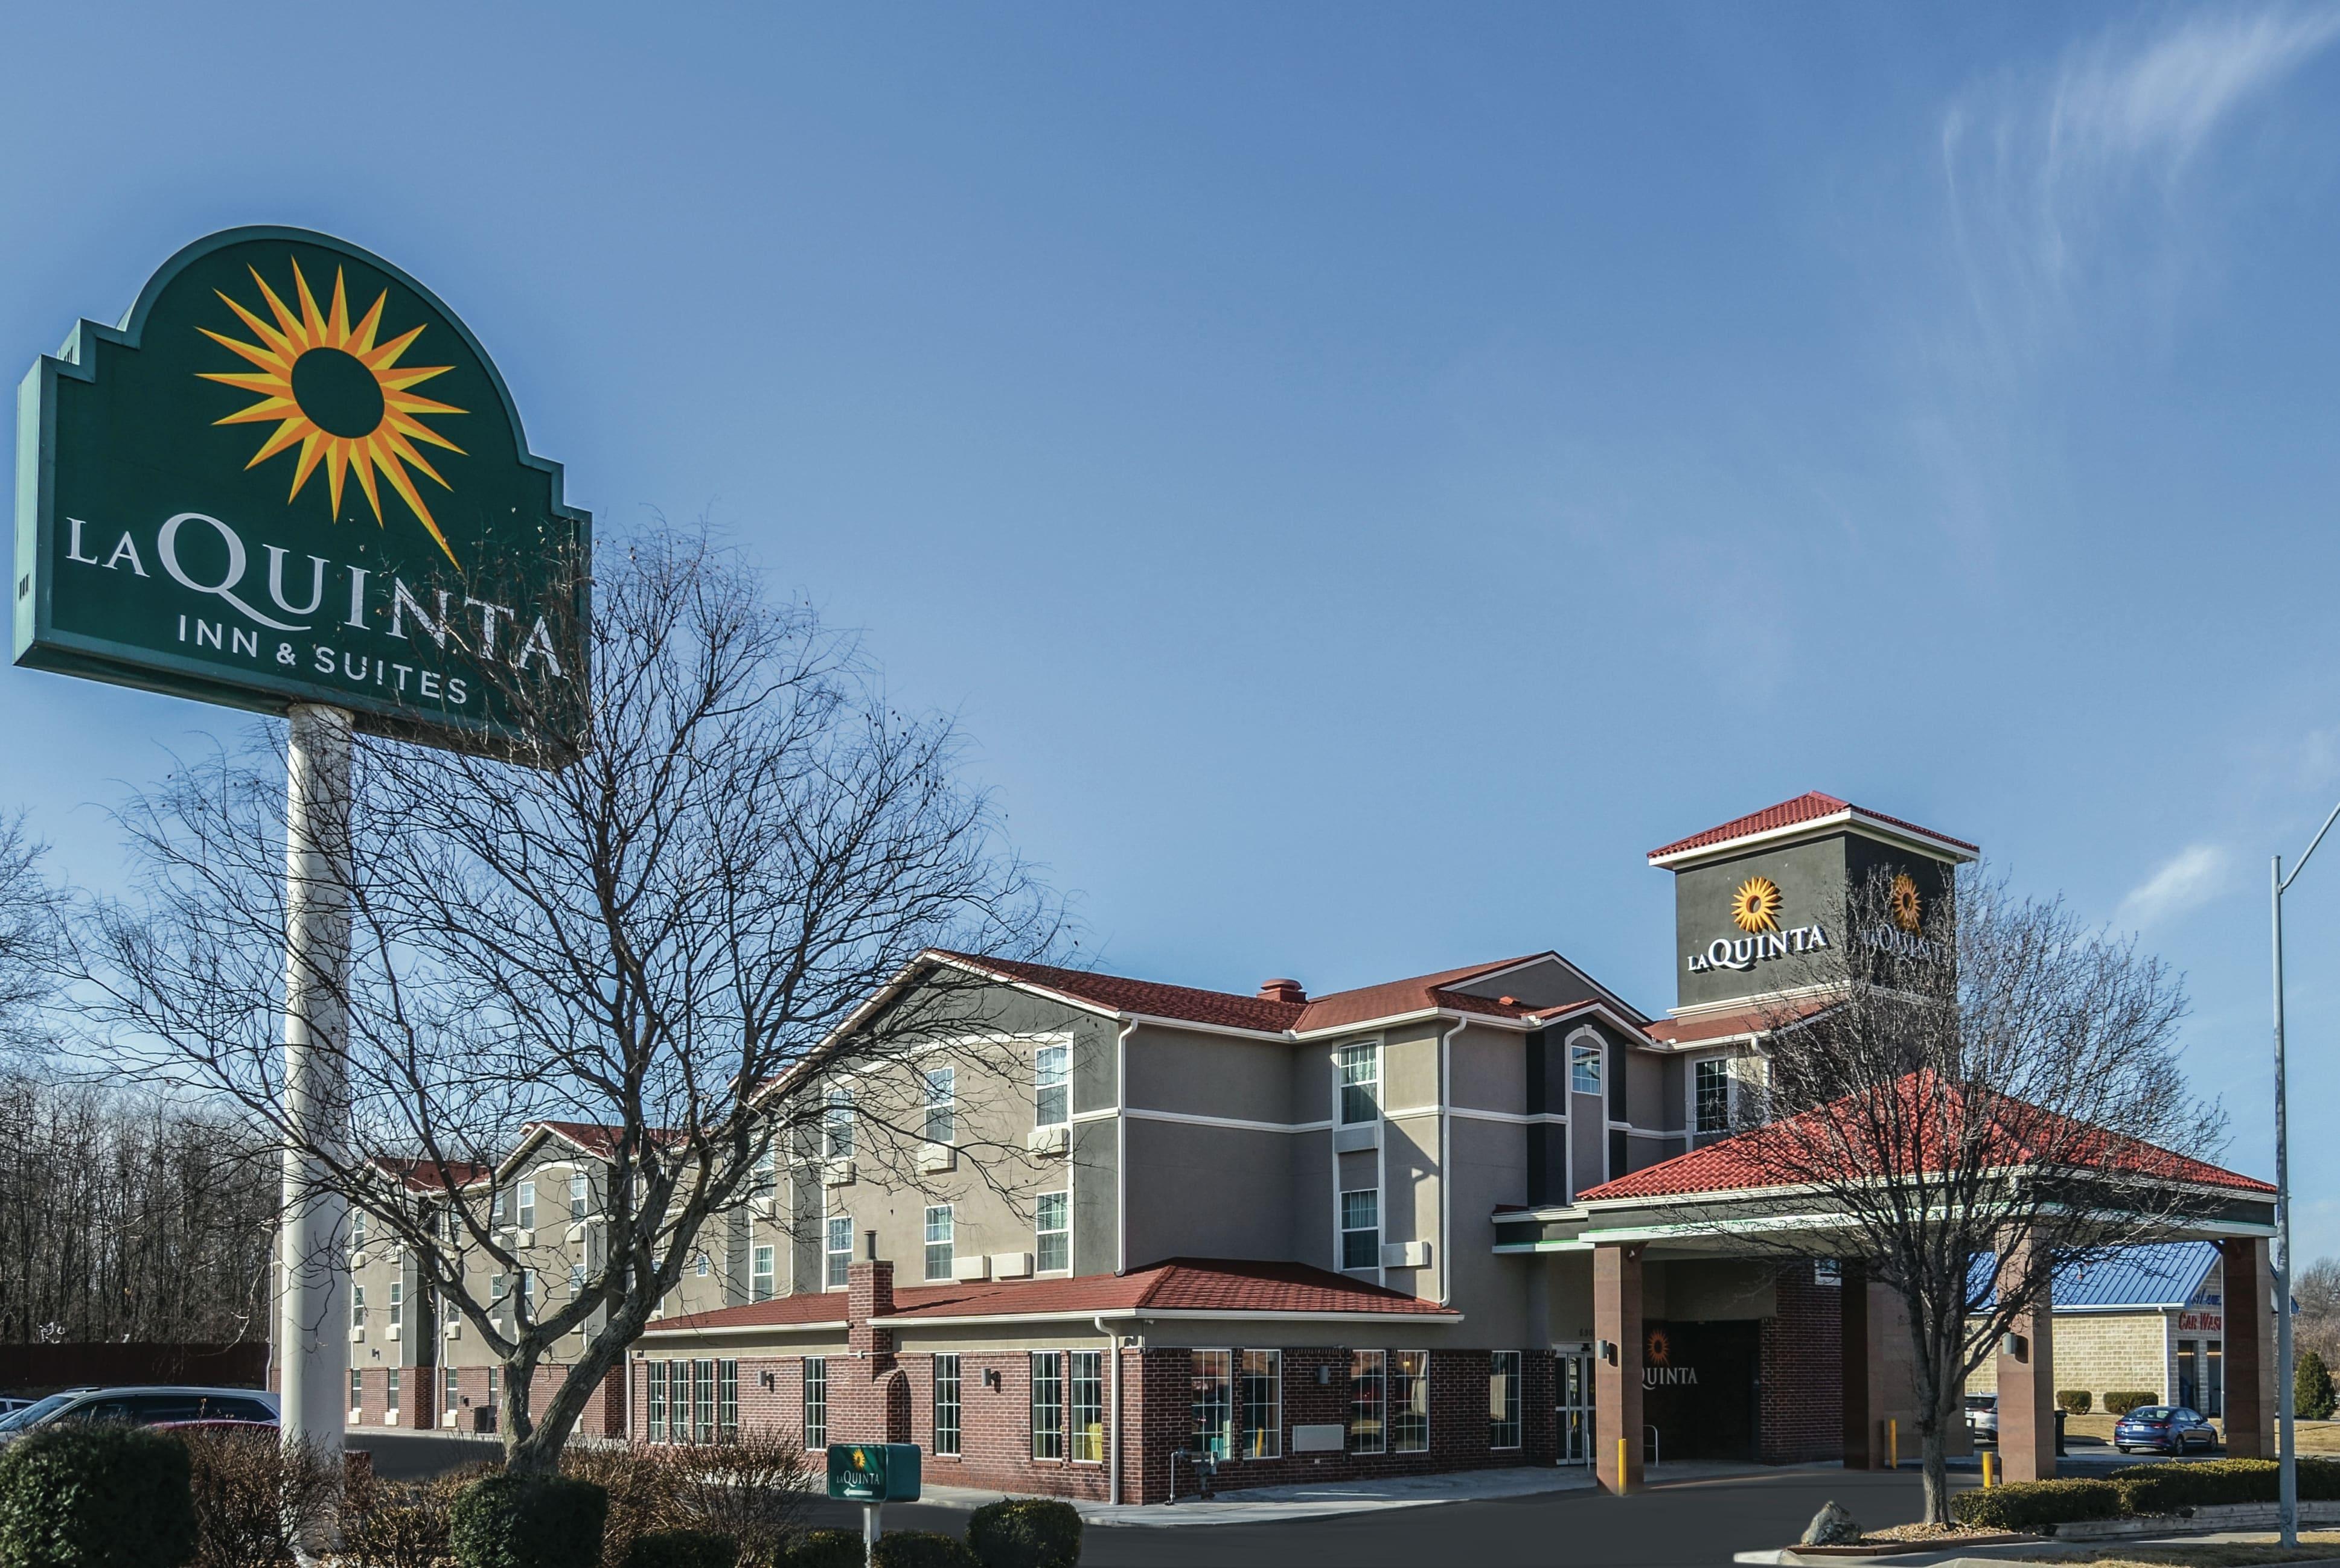 La Quinta Inn Suites By Wyndham Kansas City Airport Mo Hotels